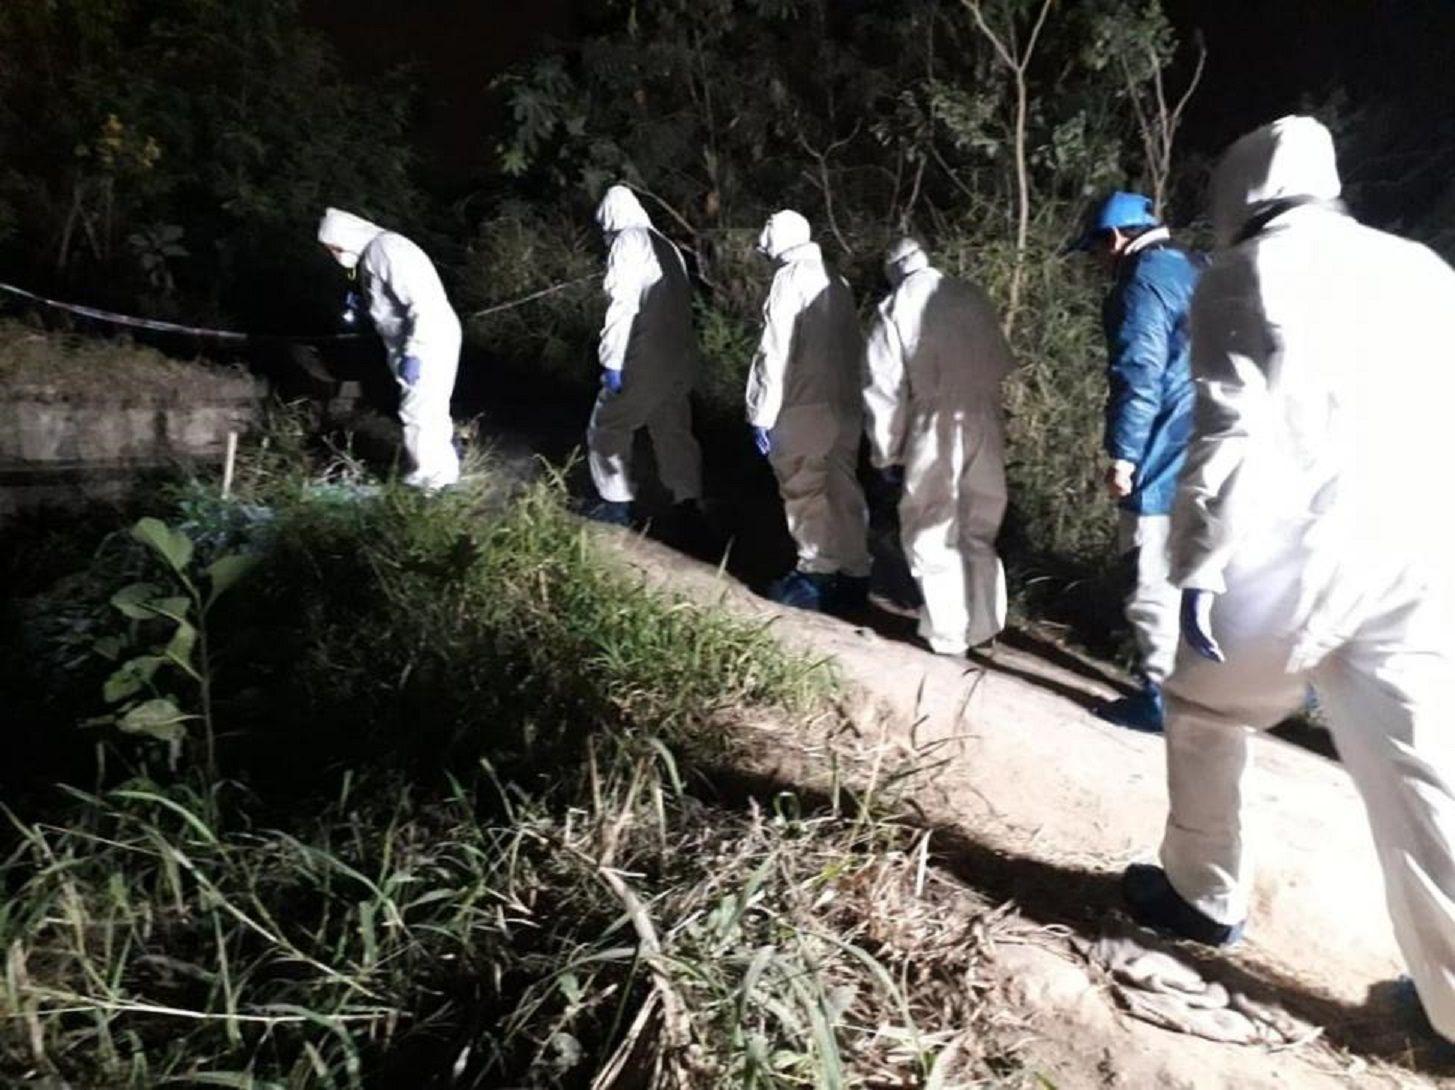 Atacaron a balazos a los investigadores del crimen del nene. Foto: La Gaceta